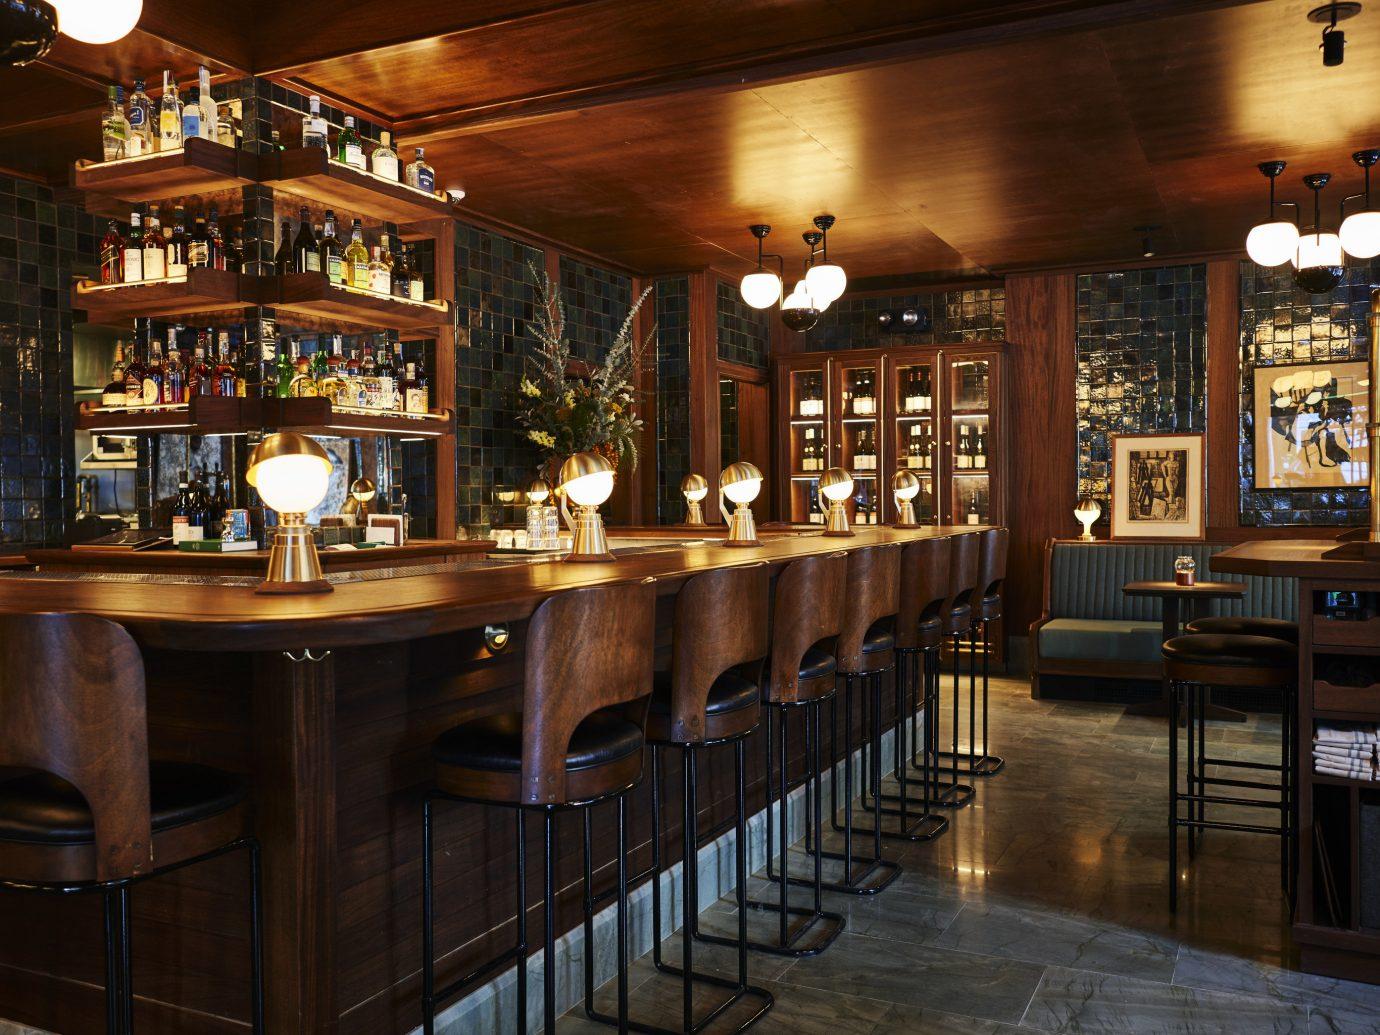 NYC Trip Ideas indoor ceiling table floor Bar room restaurant Dining interior design tavern wooden café pub shelf dining room liquor store furniture wood area set Island several